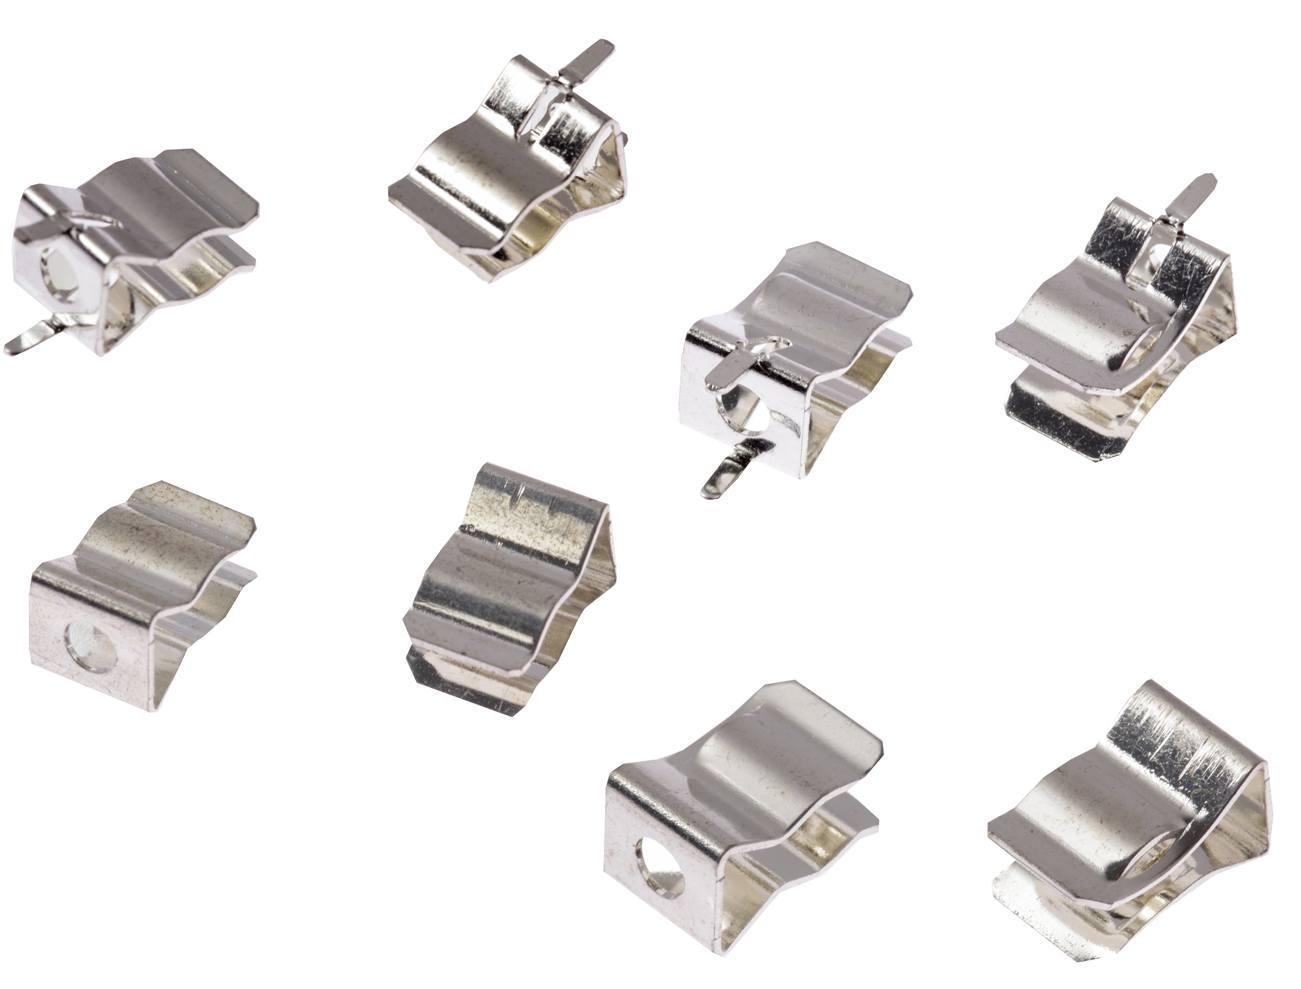 FC-4063BTXX系列保险丝夹 - FC-4063BTXX系列250V 10A 6x30mm 黄铜保险丝夹(光亮镀锡)